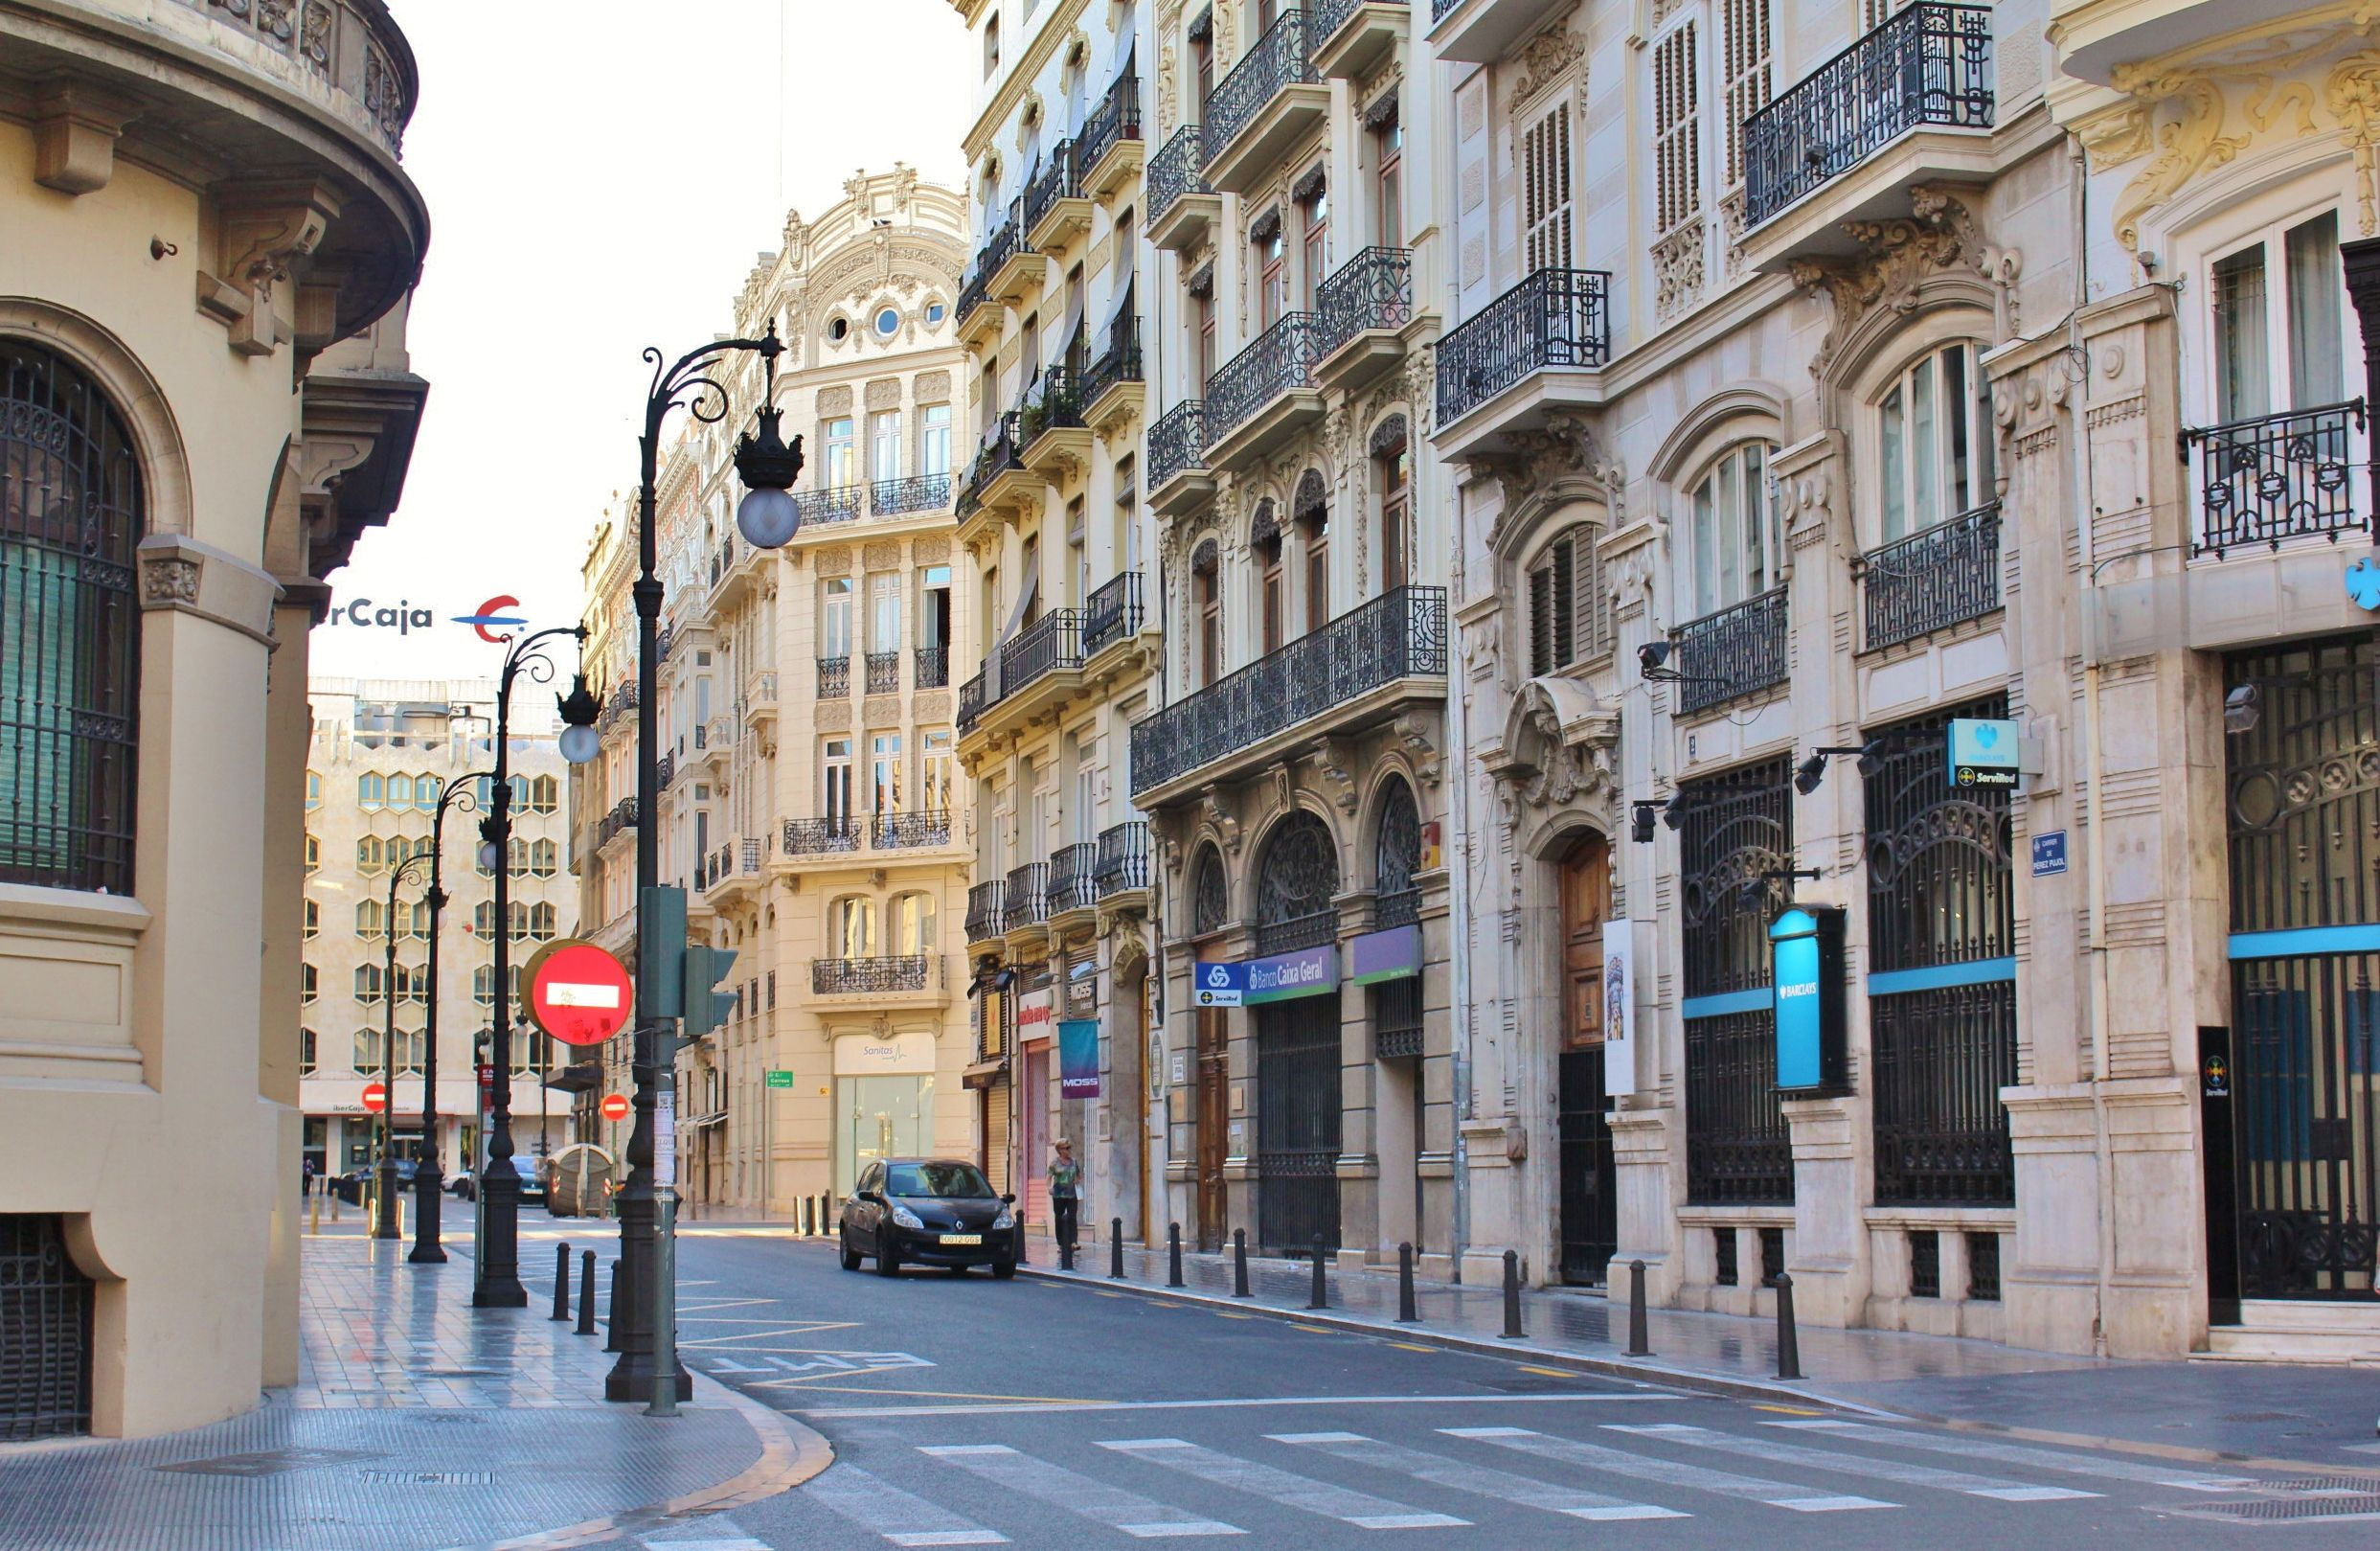 Spanish corners | Street view, Scenes, Travel